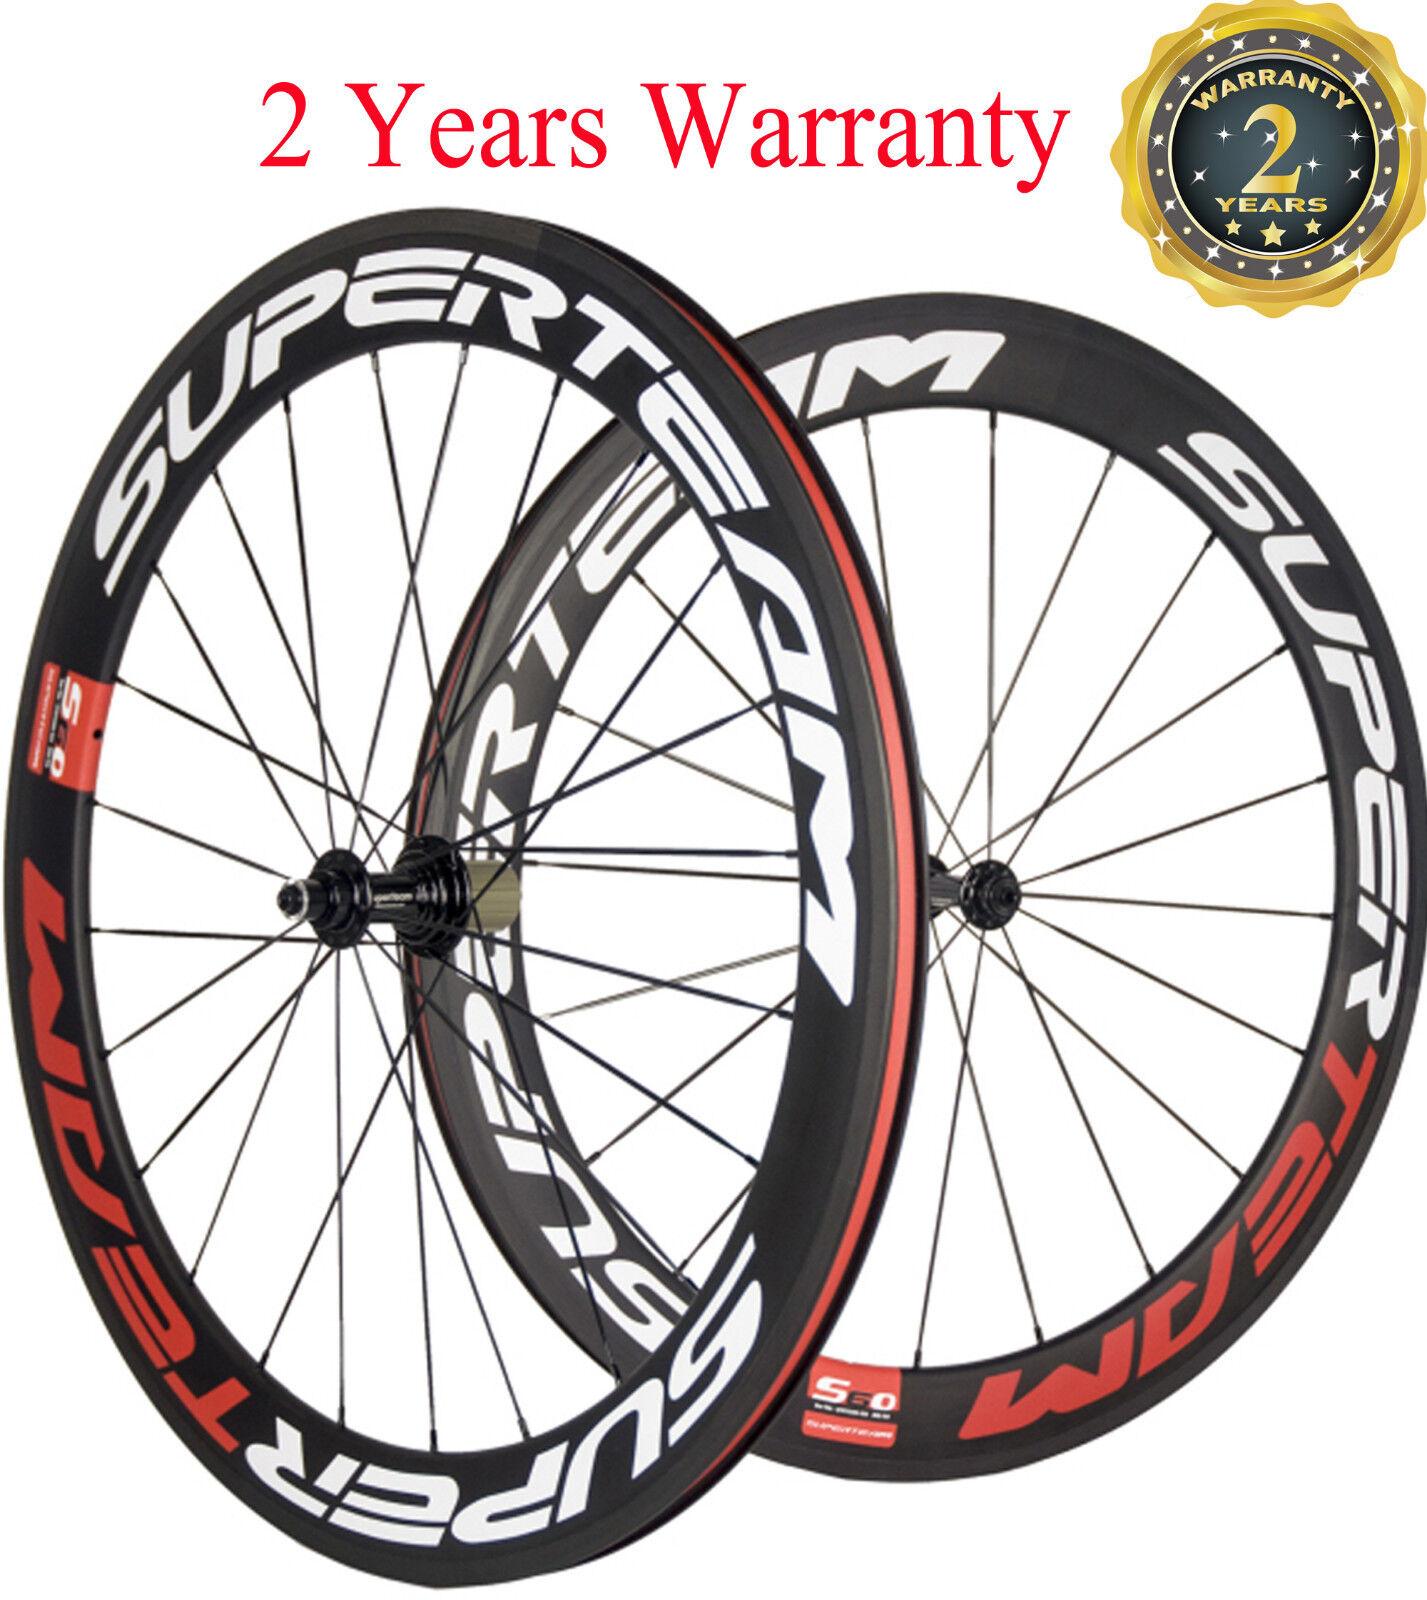 Superteam 60mm Road Bike Wheels Racing Bicycle wheels Carbon Clincher  700C Race  sale online discount